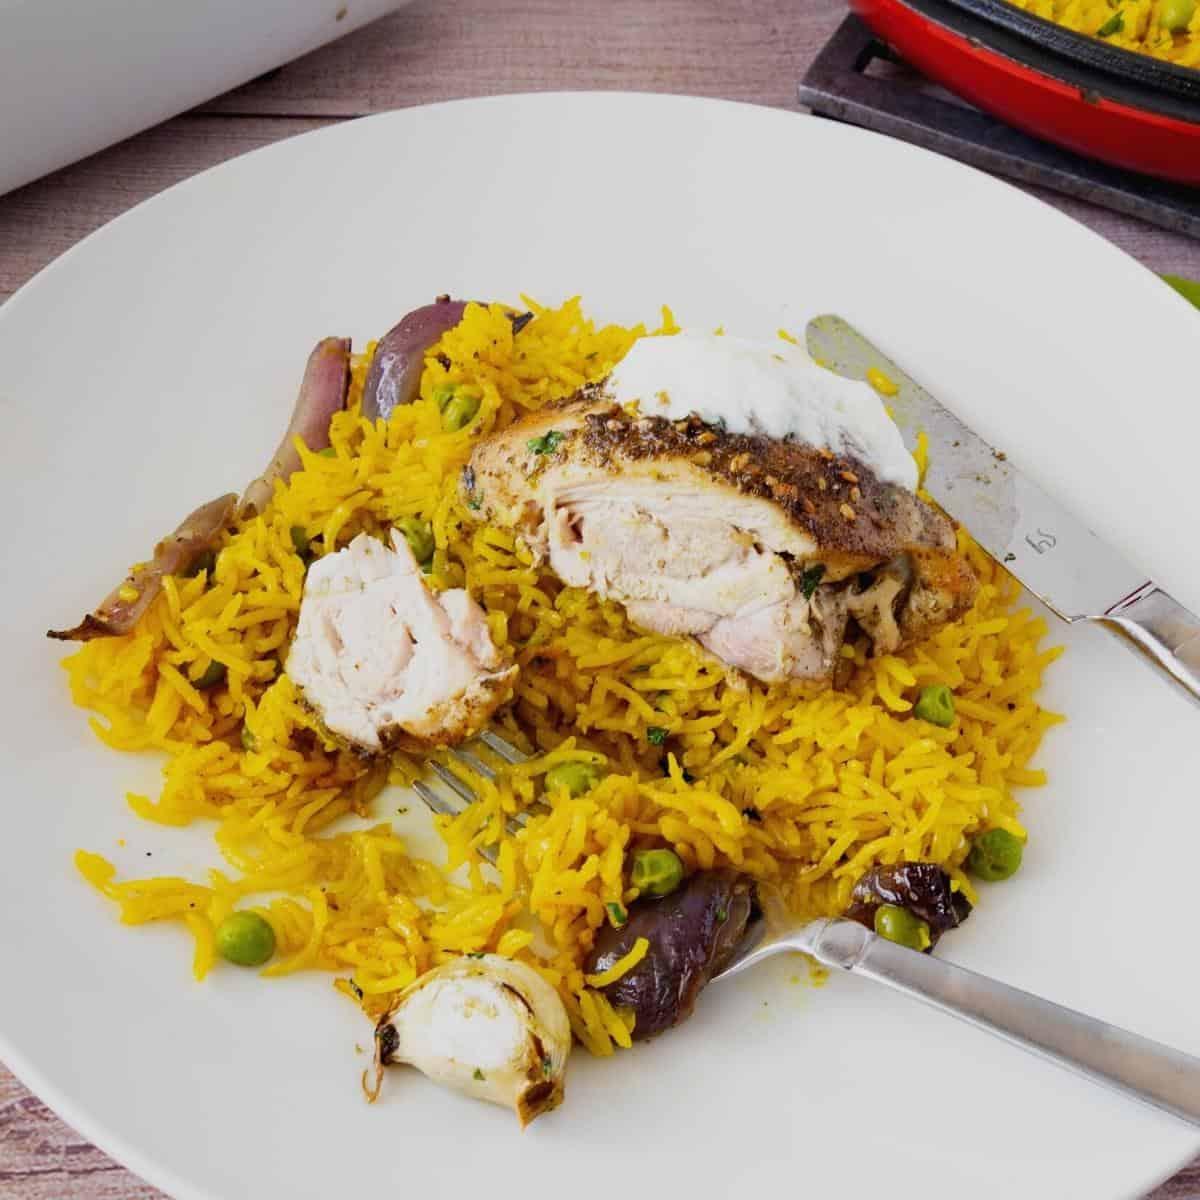 Chicken served over rice